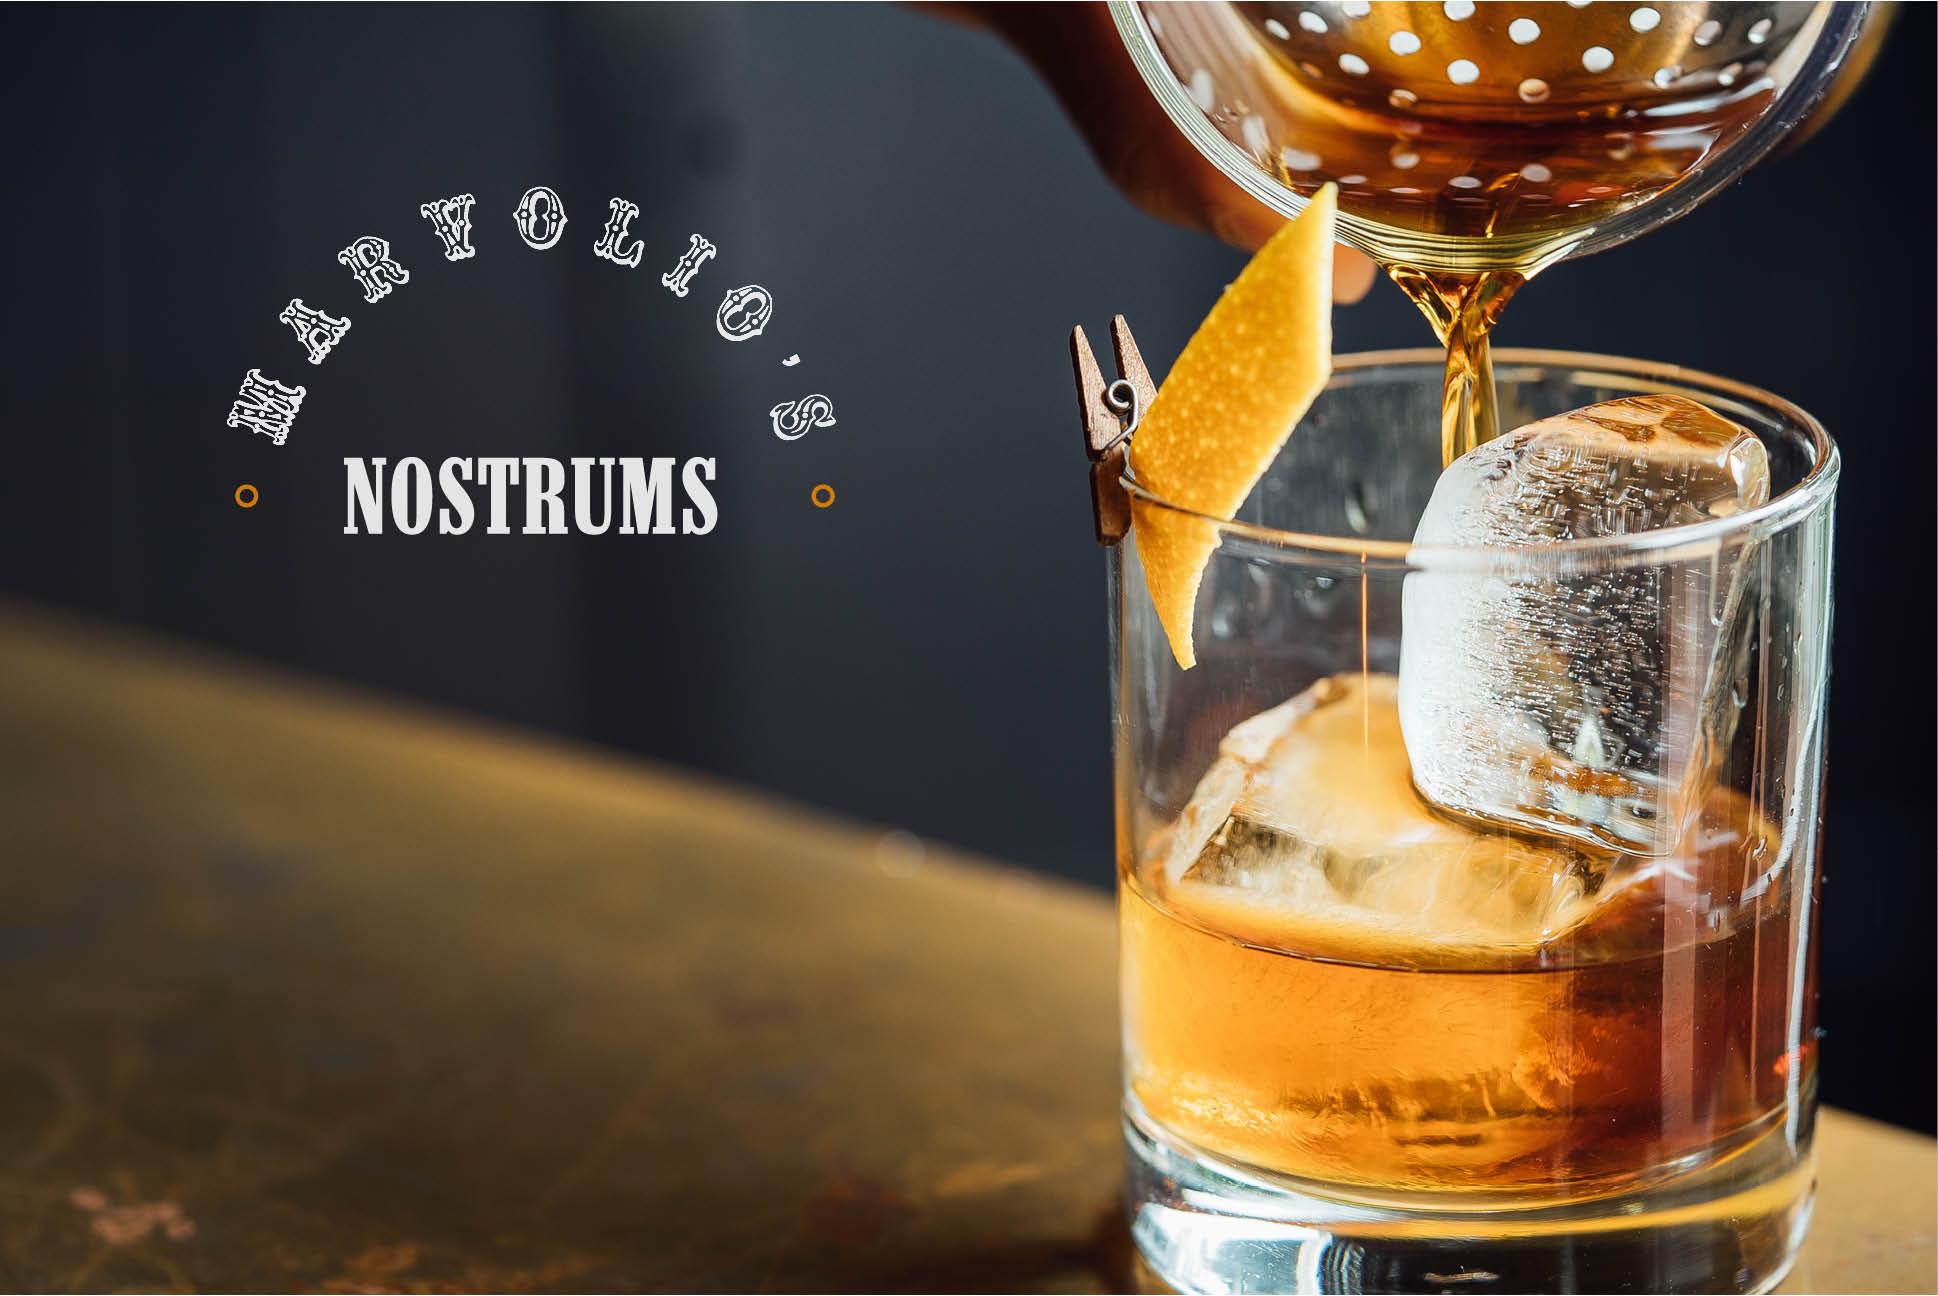 Marvolio's Nostrums branding | Marvolio's Nostrums | Independent Marketing Packaging, Design and Website Design Services | IM London